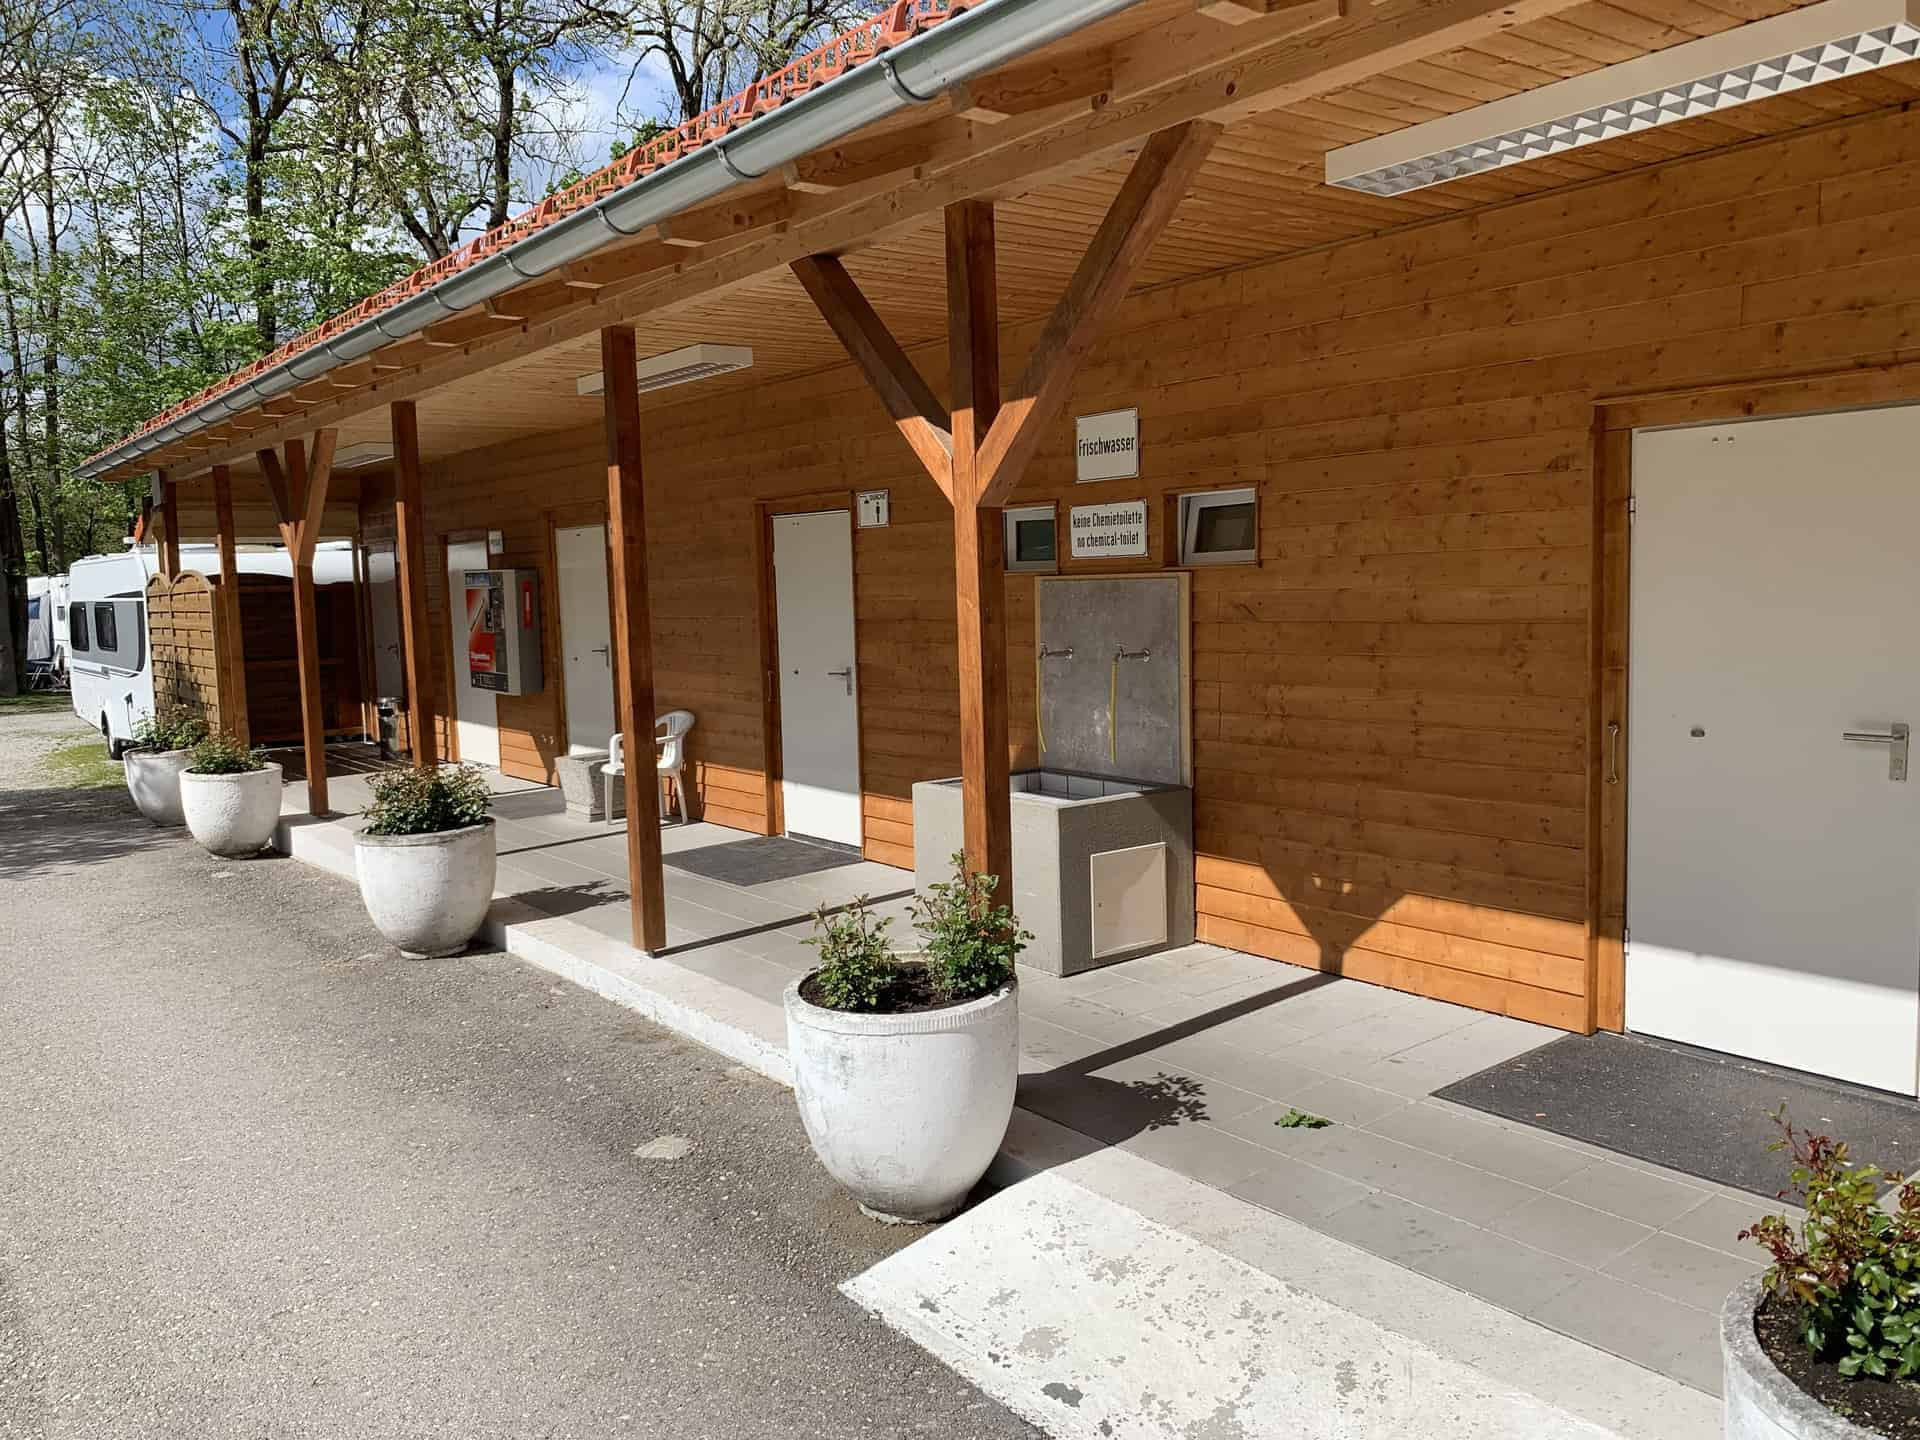 Campingplatz_München_Nord_West_Sanitär